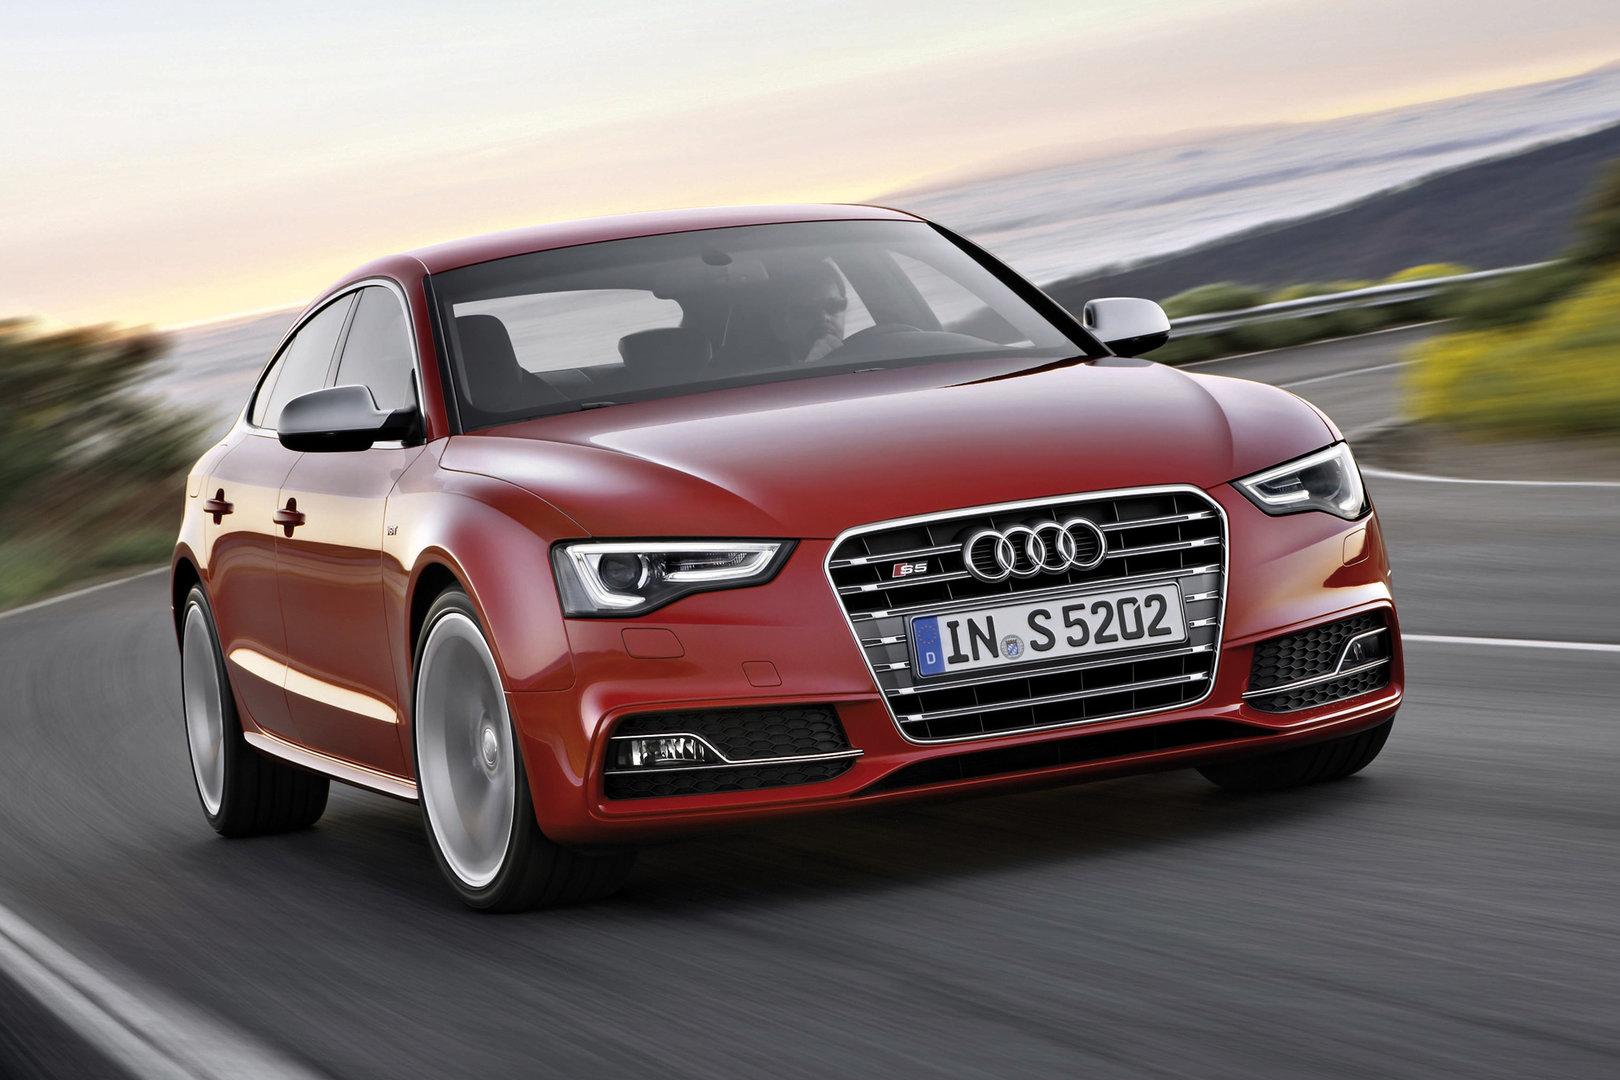 Coche del día: Audi S5 Sportback 3.0 TFSI (B8.5)